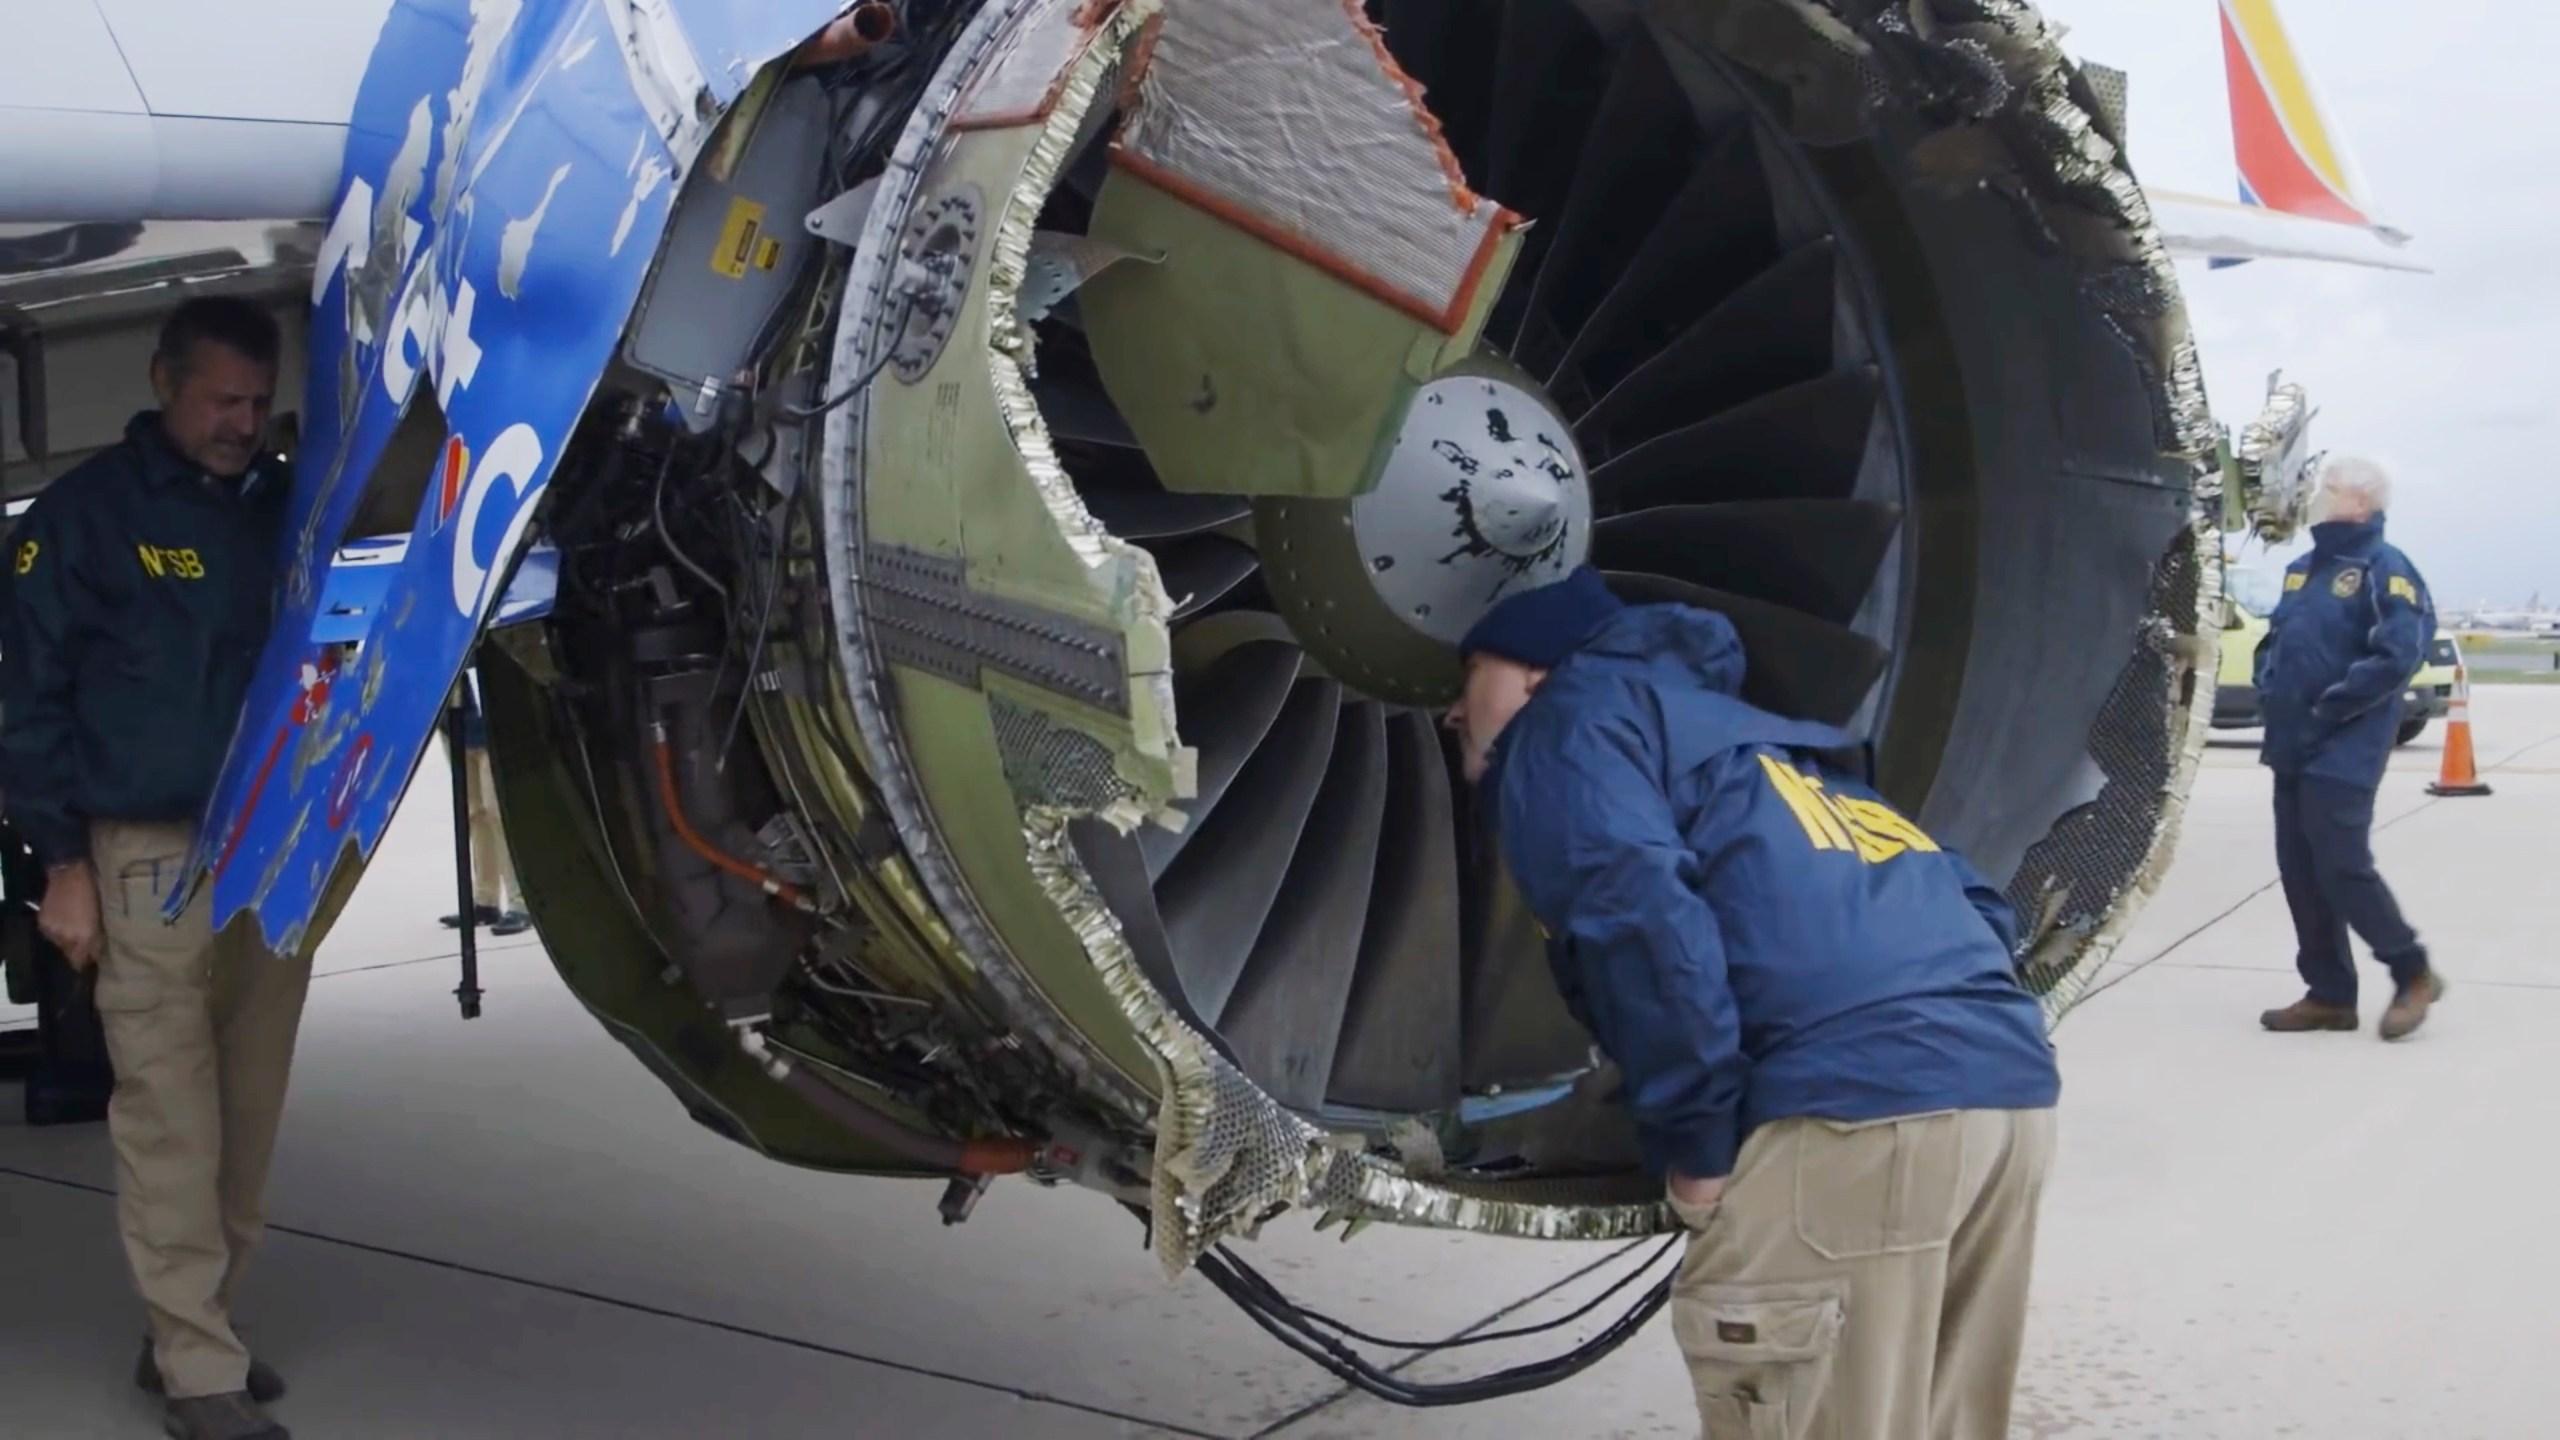 Southwest_Airlines_Emergency_Landing_40984-159532.jpg67468332